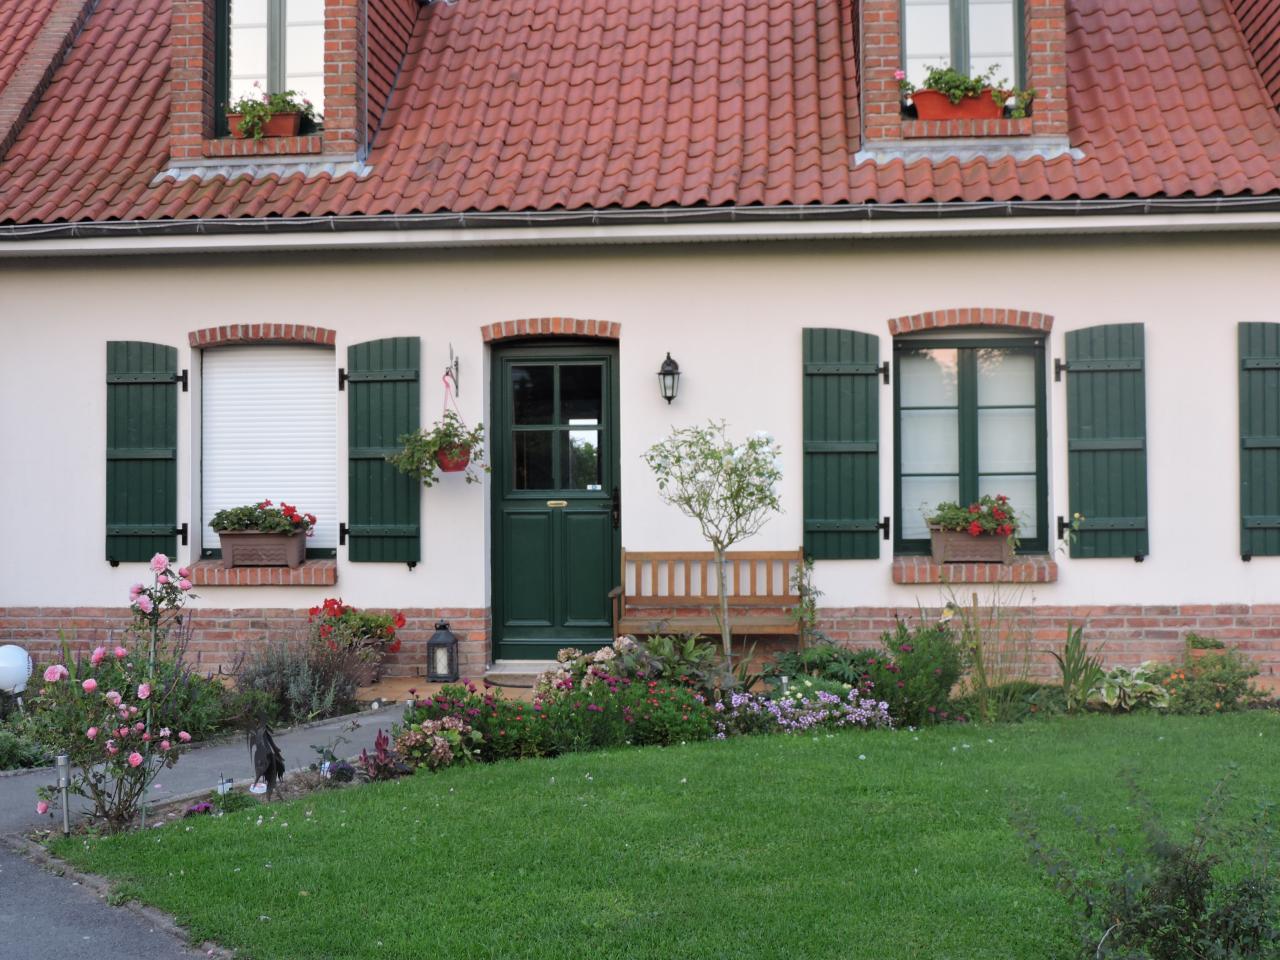 Maisons fleuries 2014 (47)